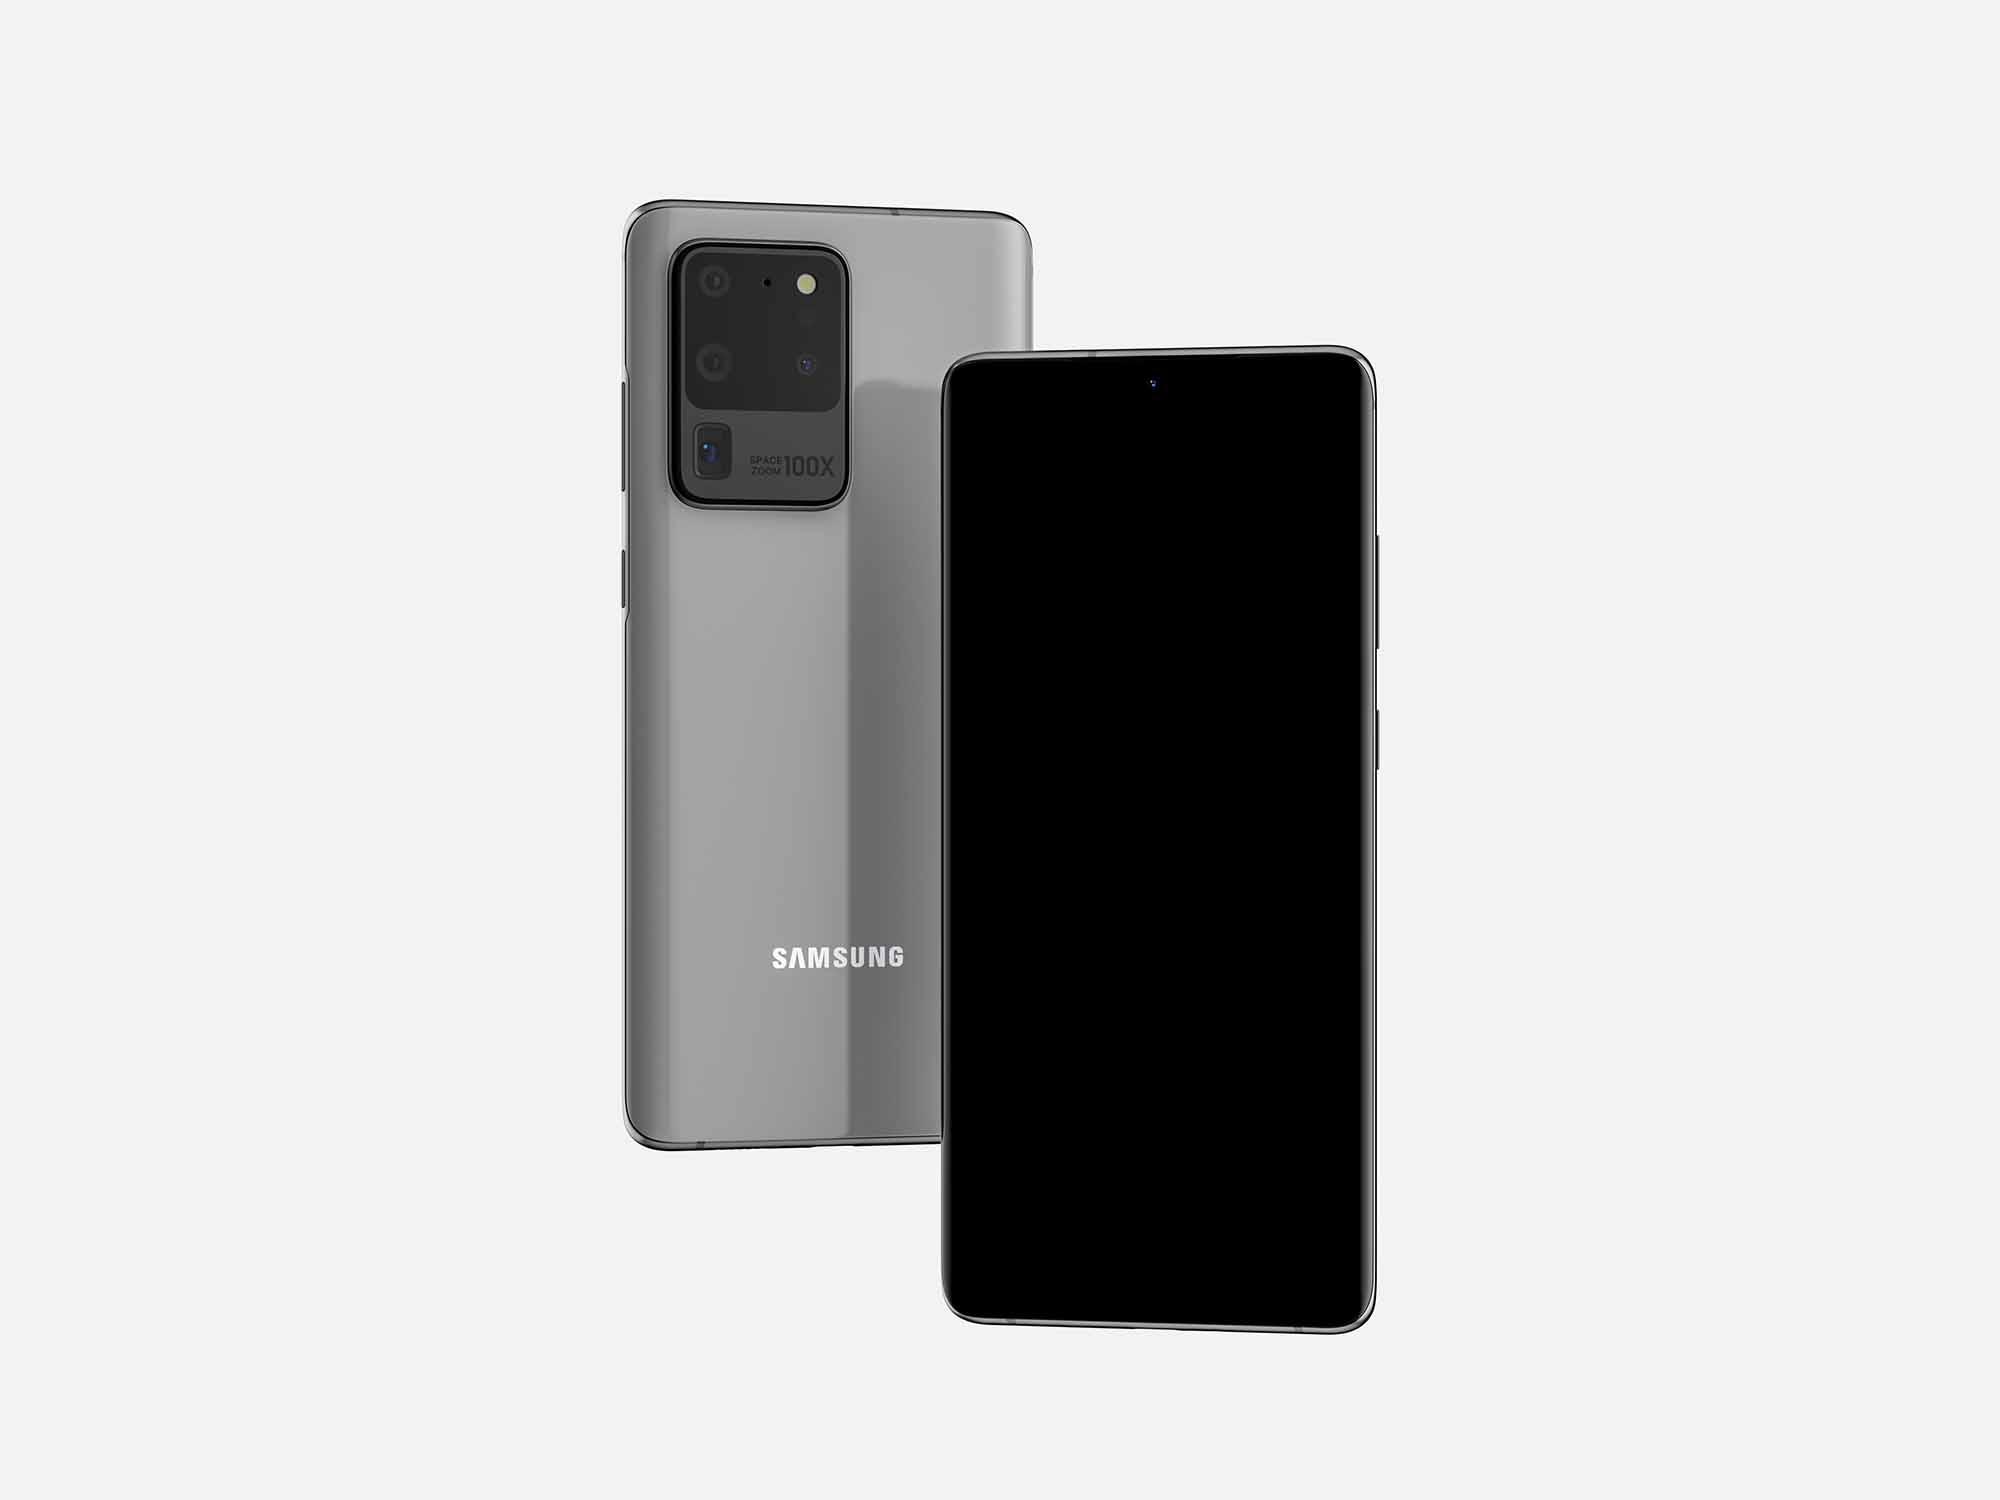 Samsung Galaxy S20 Ultra Mockup 2